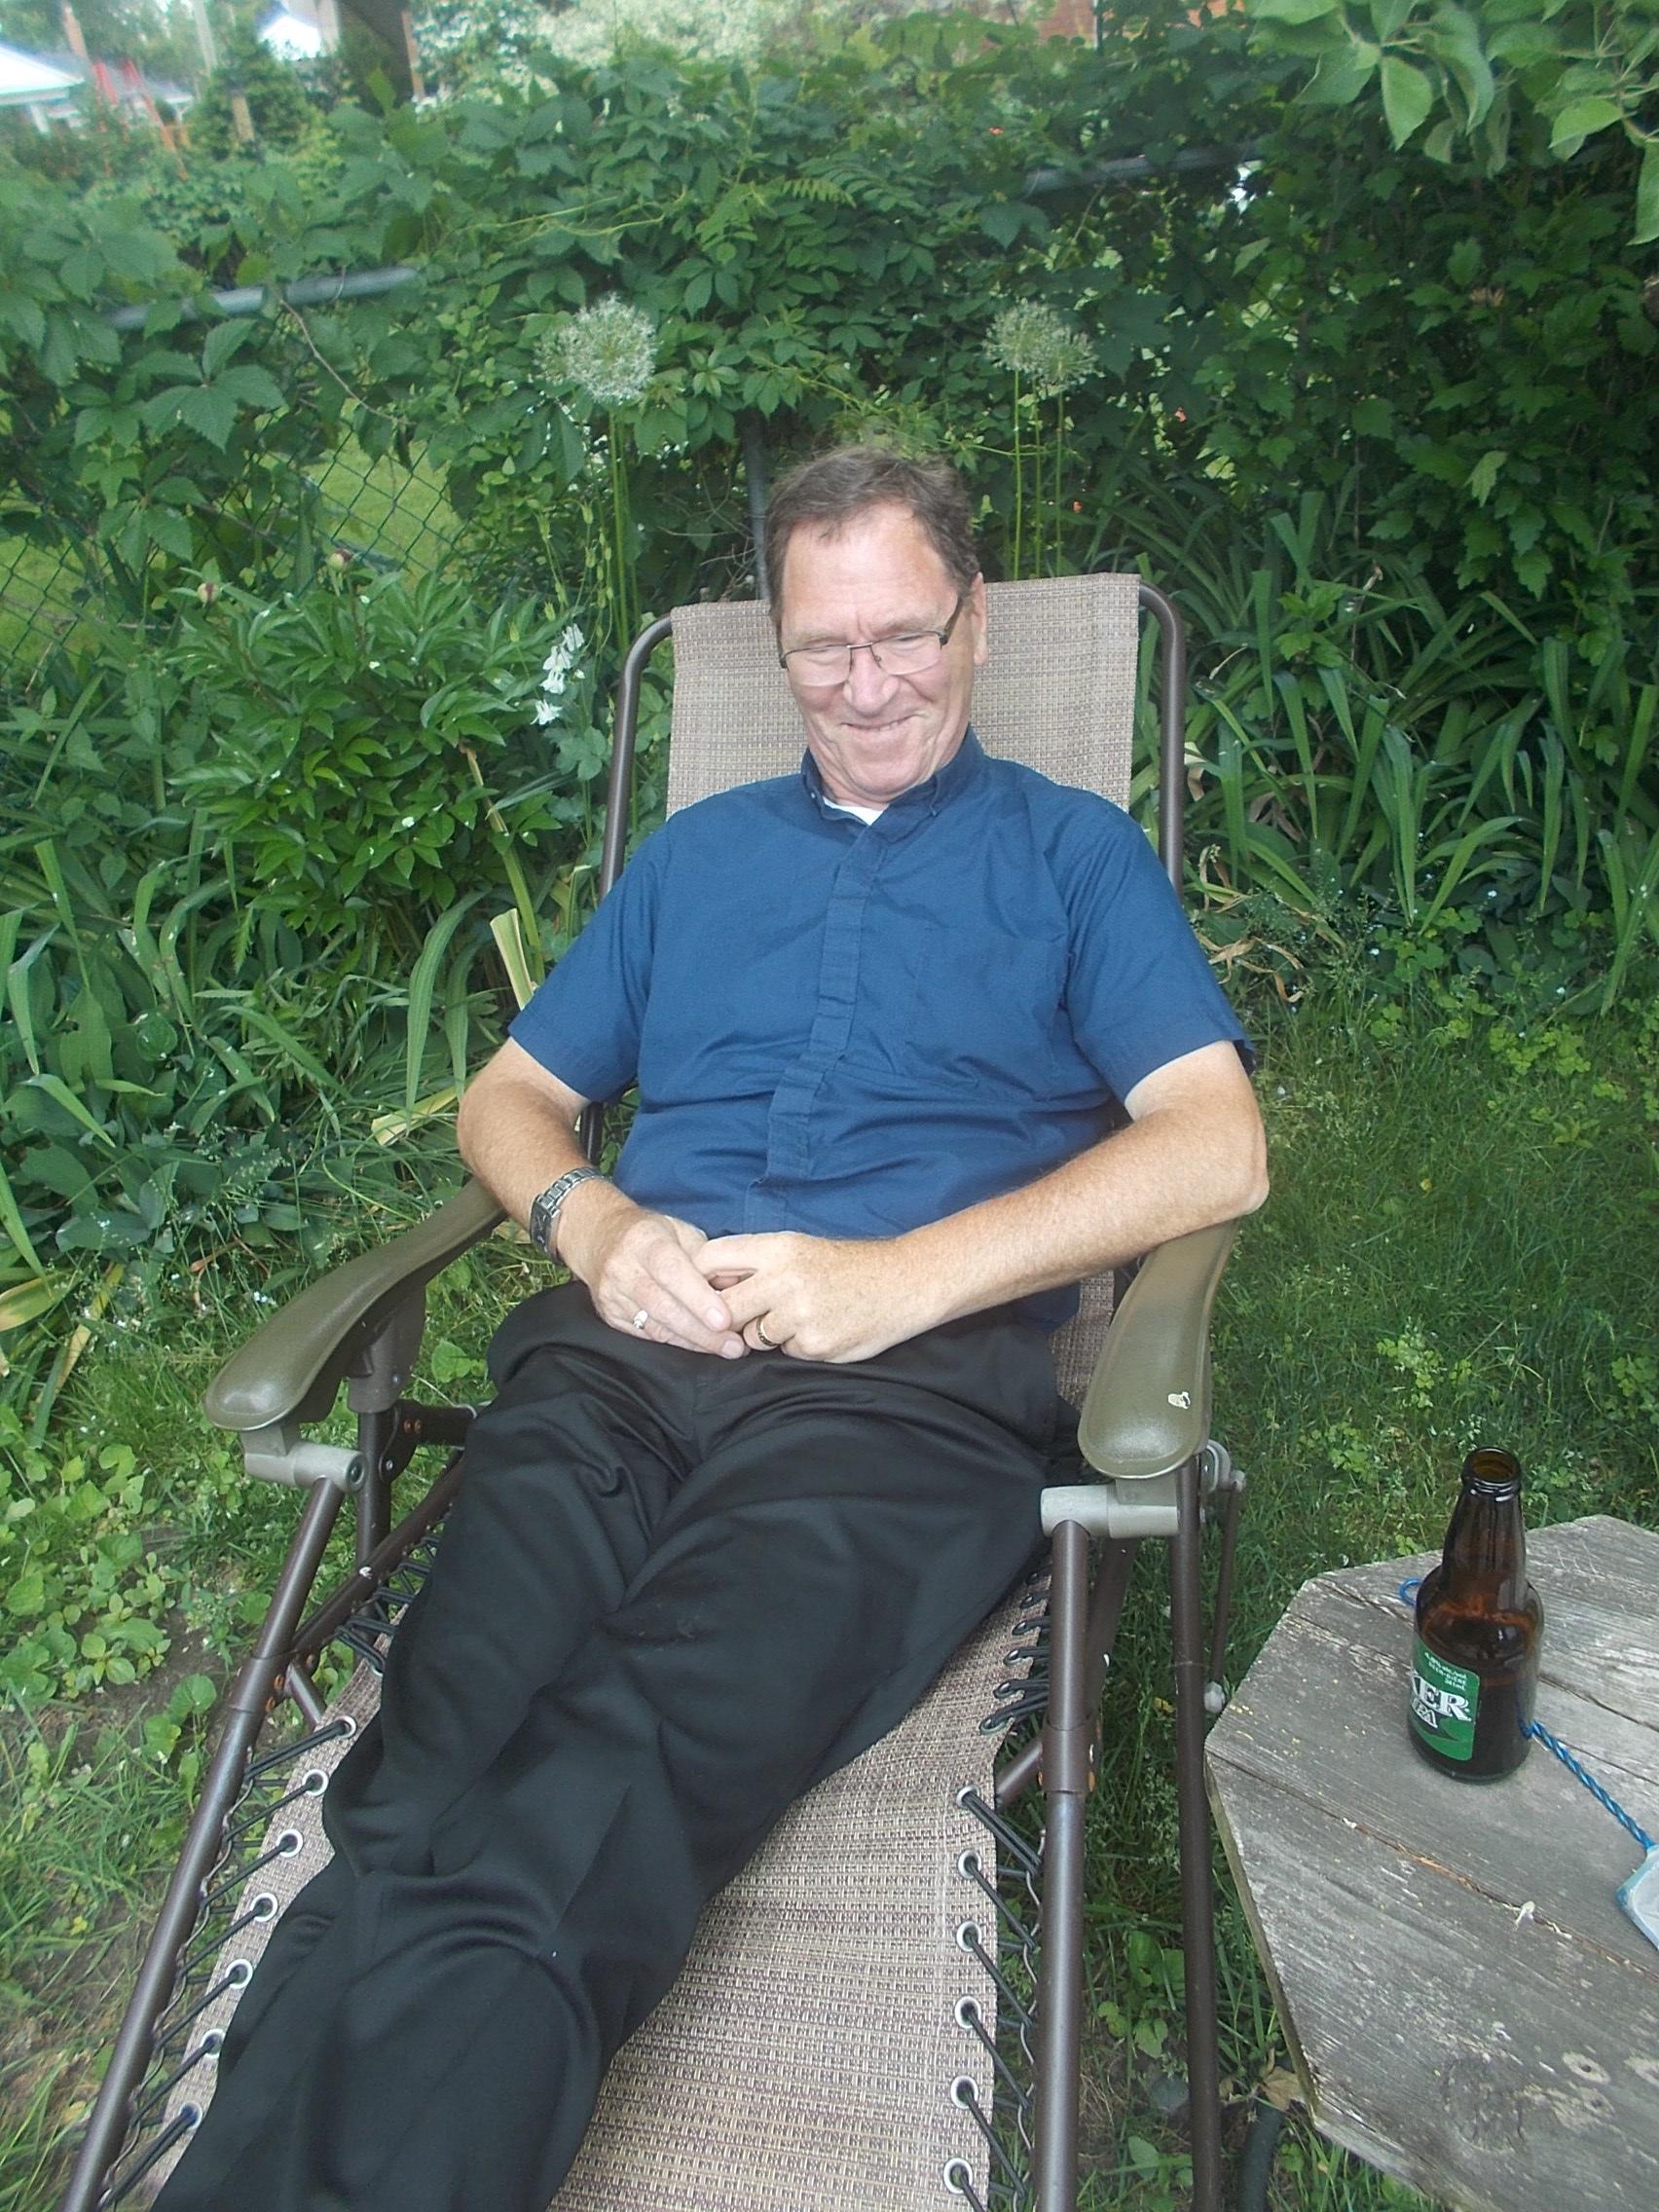 #zero gravity chair, #grammieo,#father's day